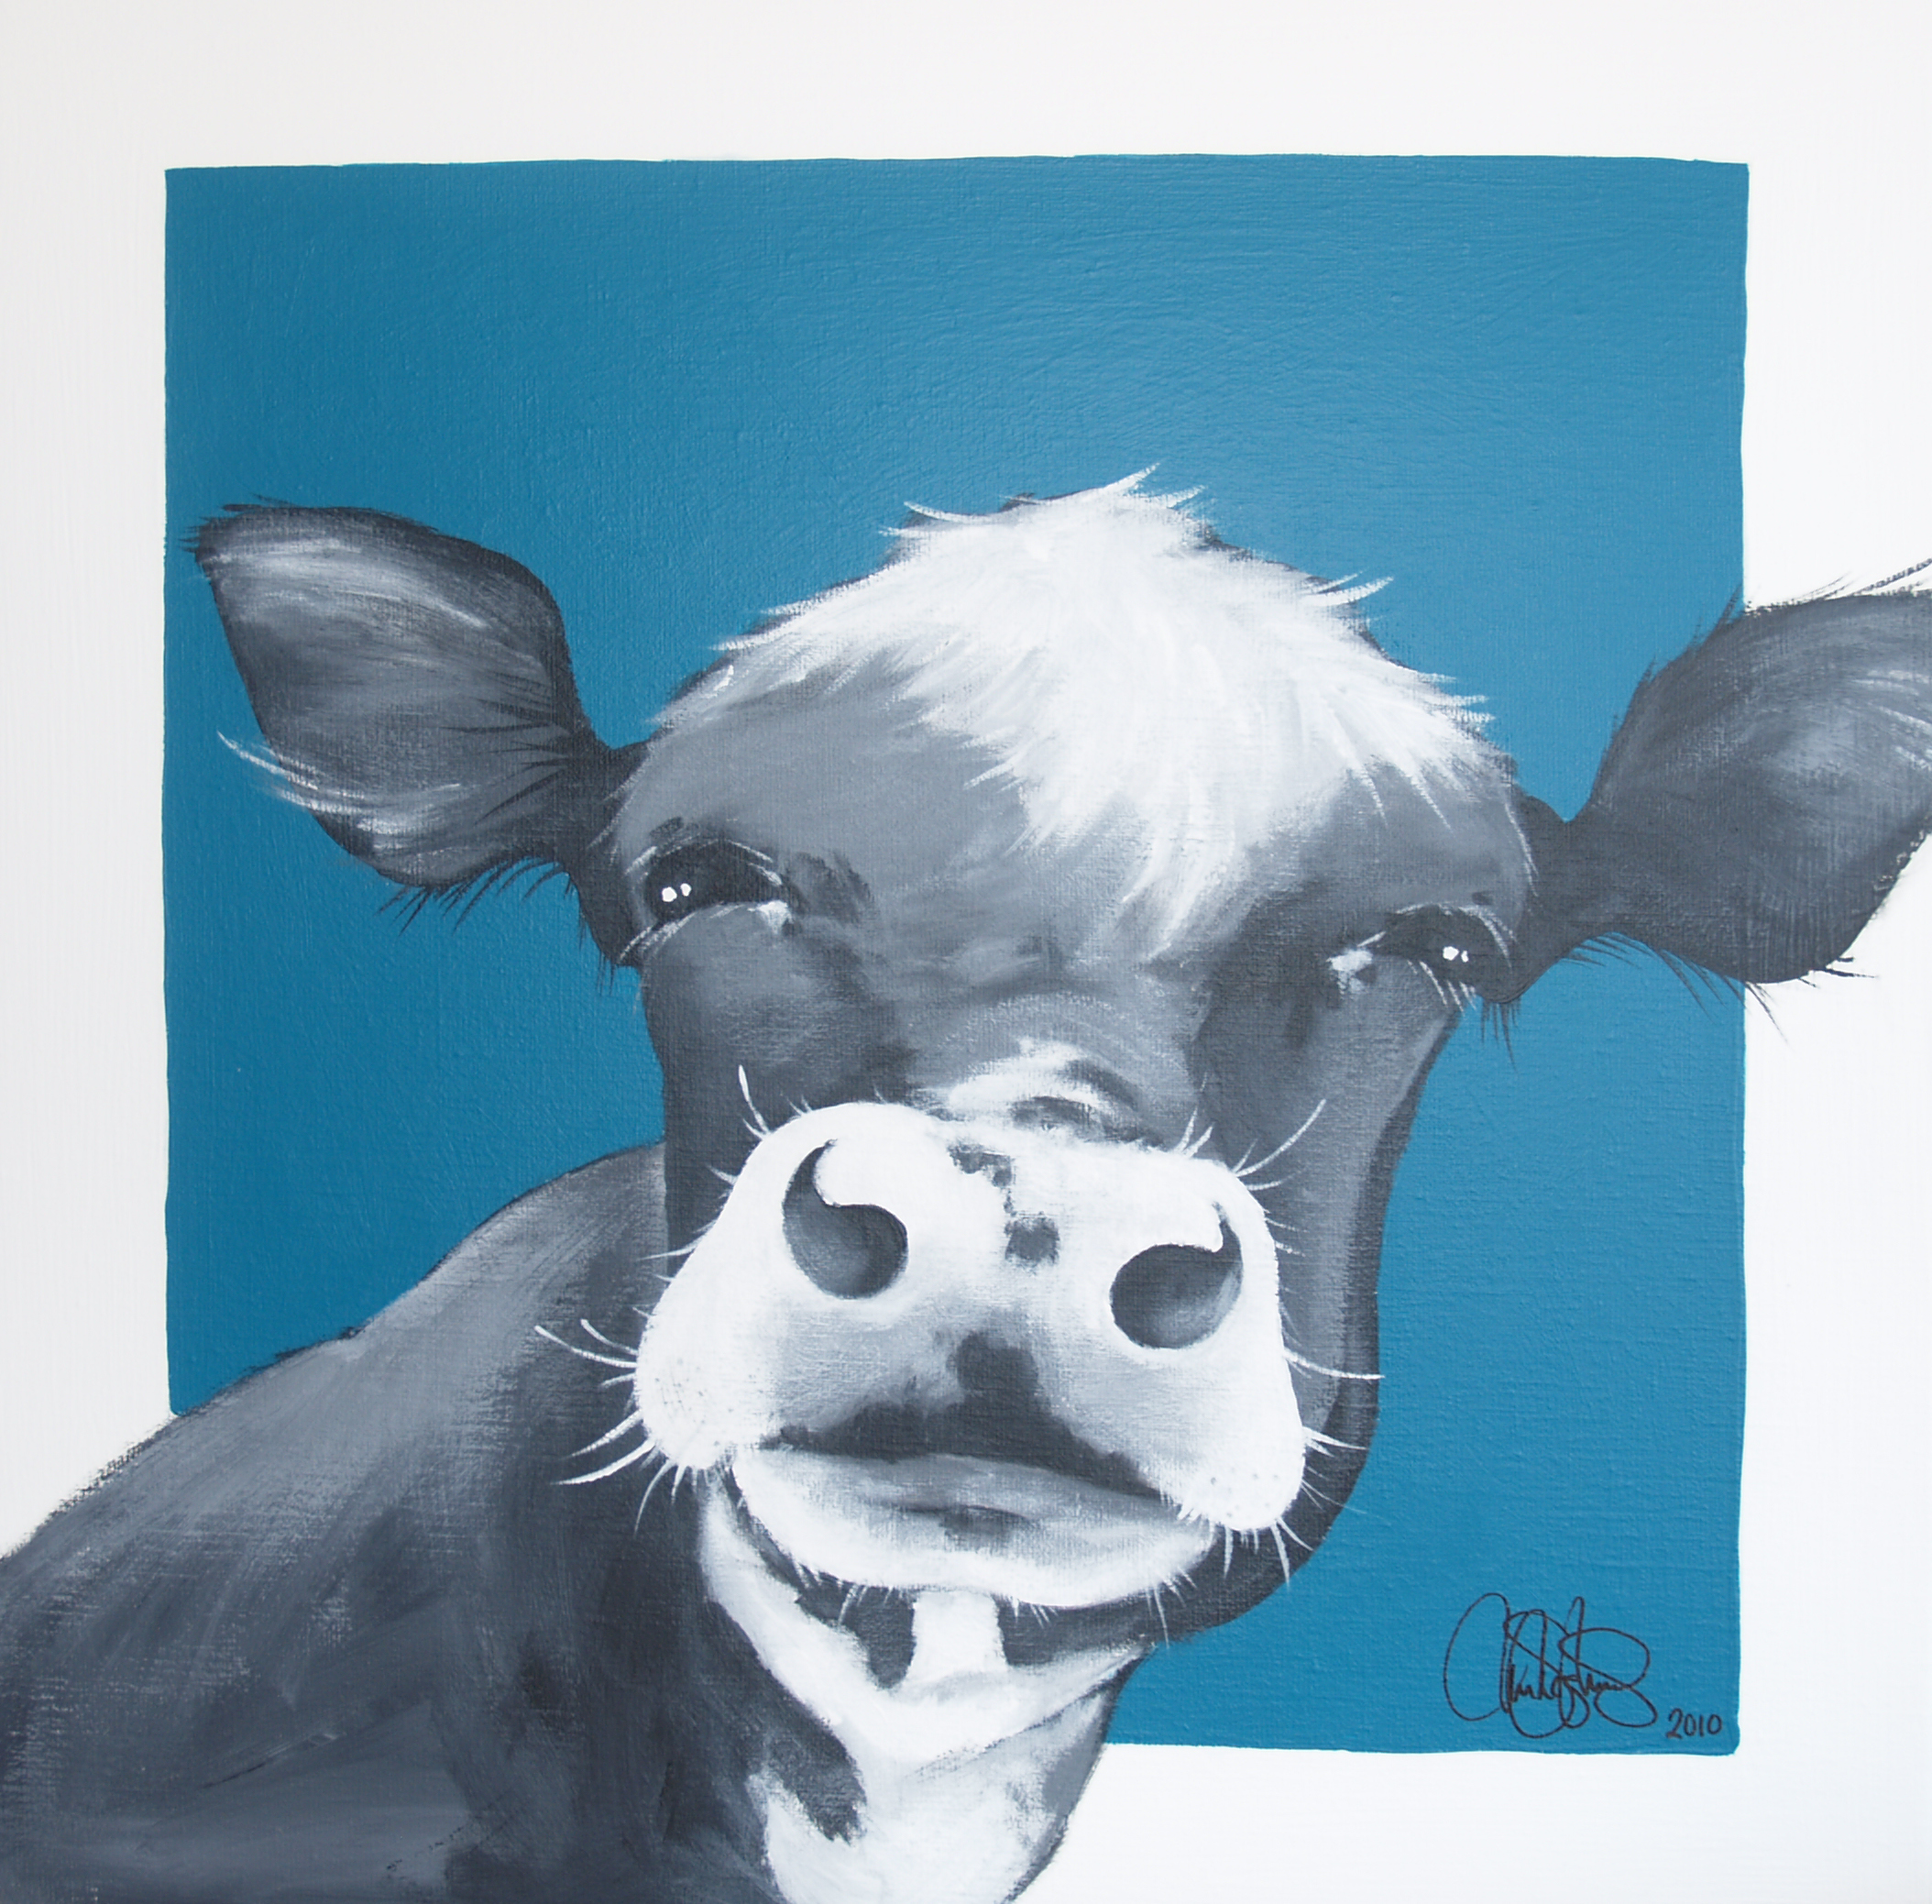 Akrylmålning i original på uppspänd duk. 50x50cm. Såld